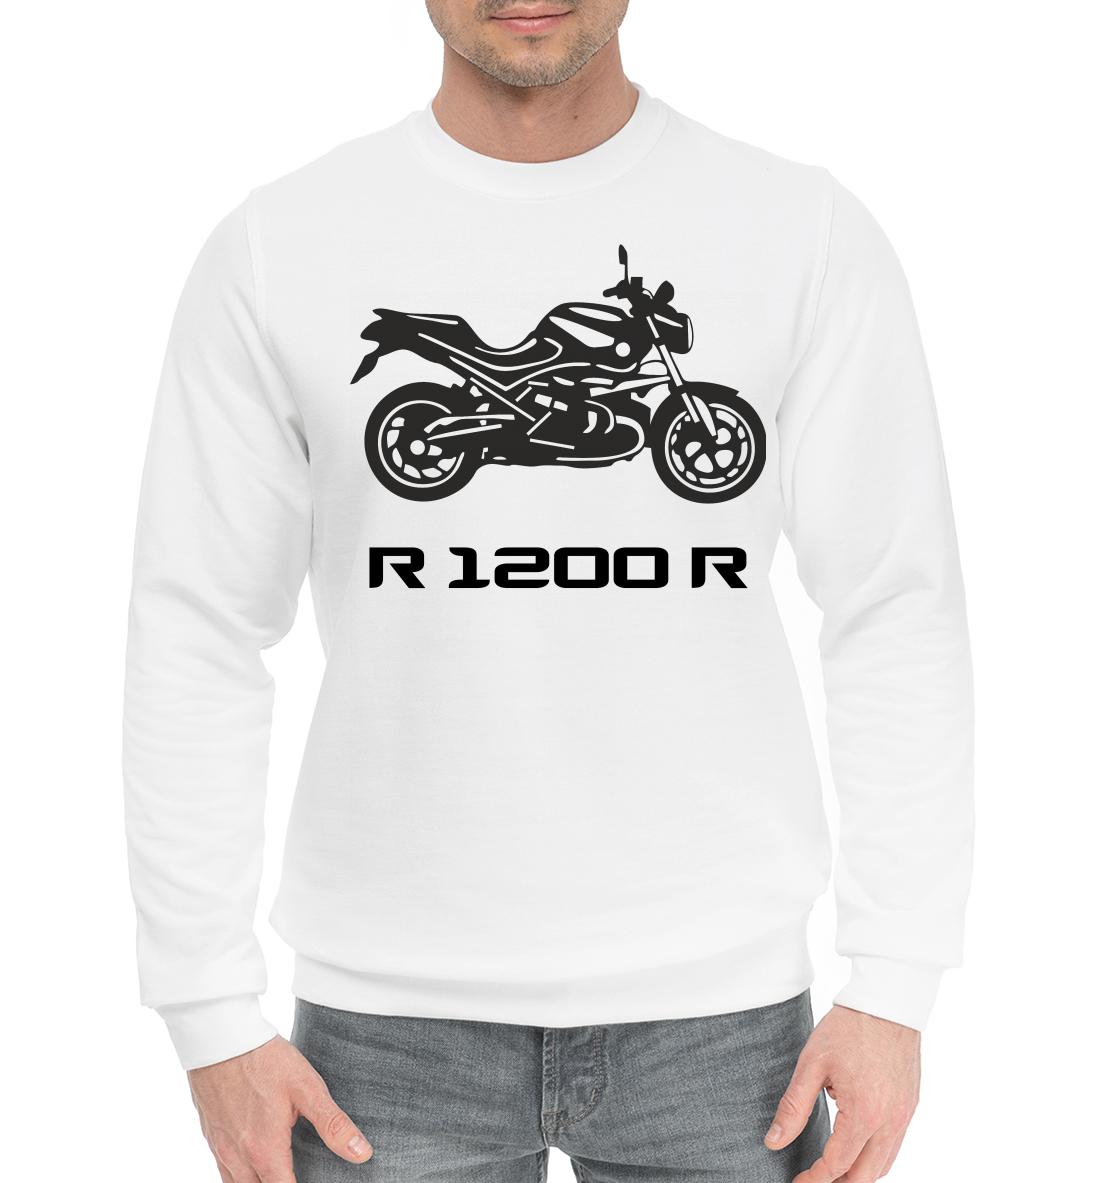 R 1200